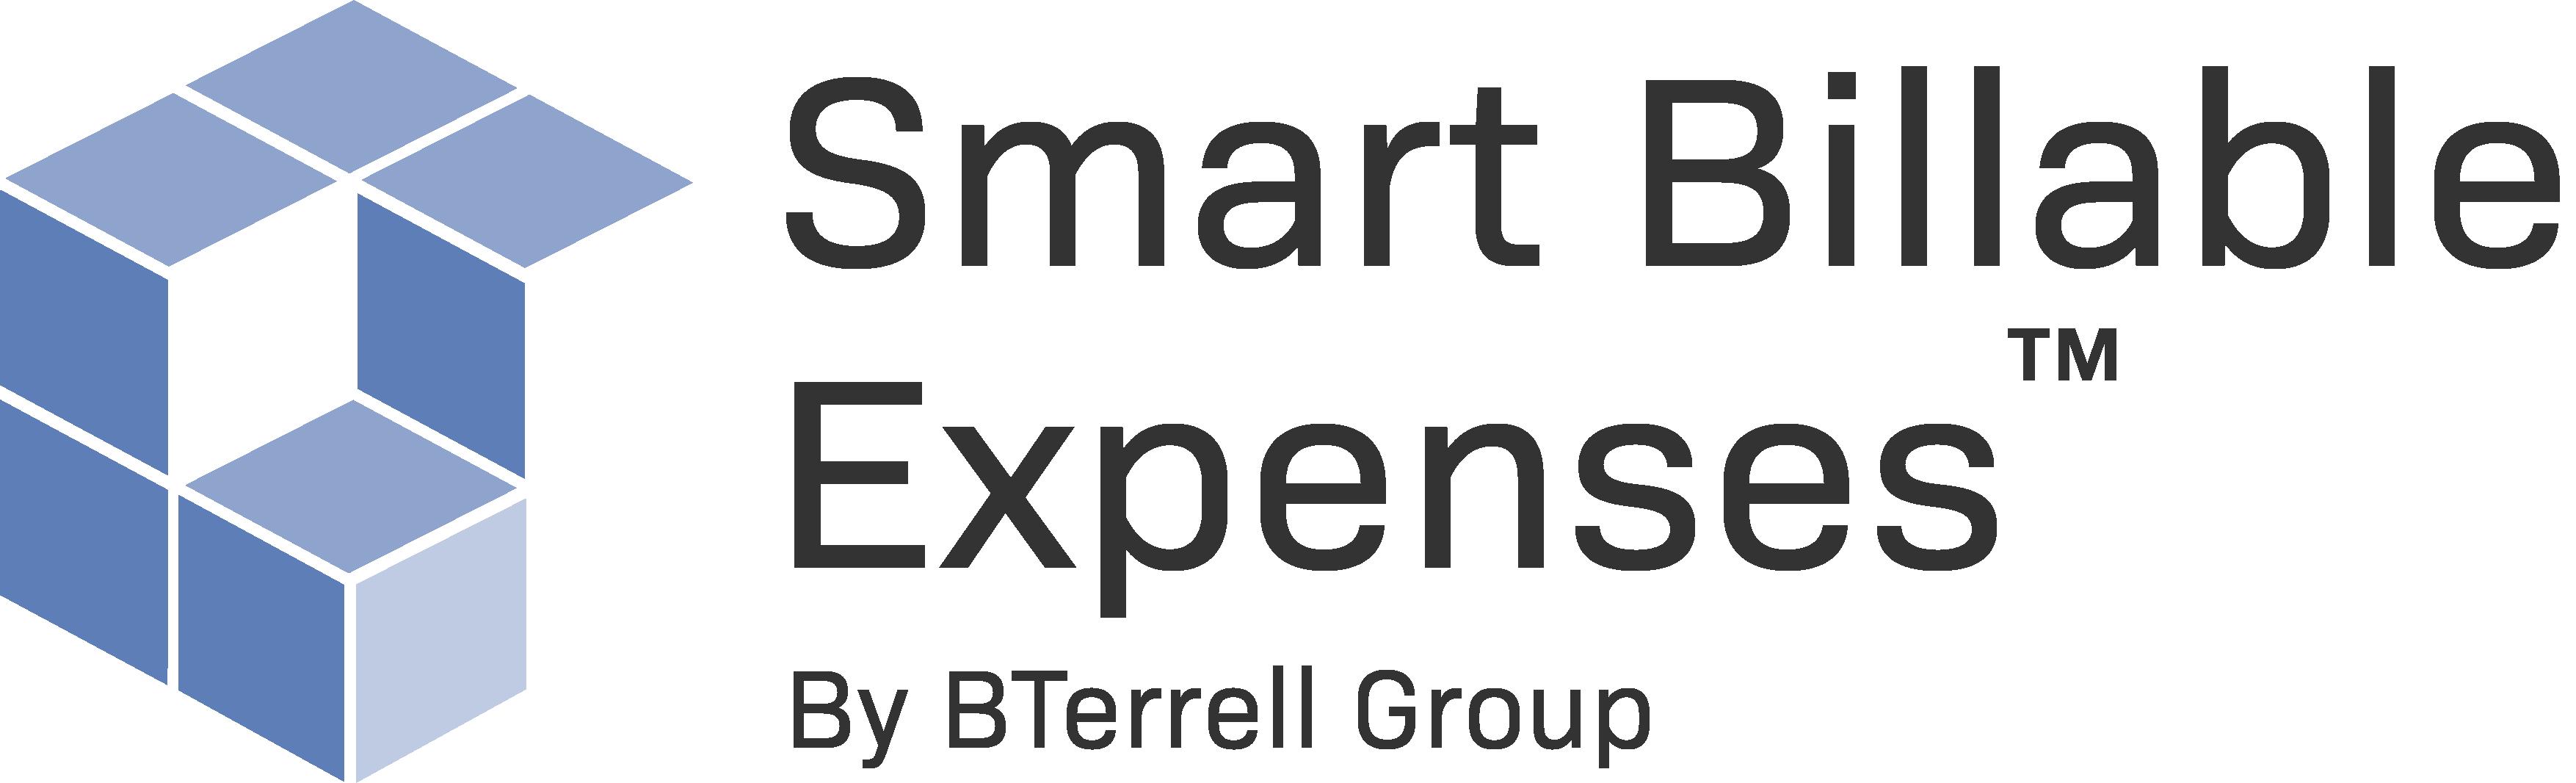 BT_BillableExpenses_v20210401